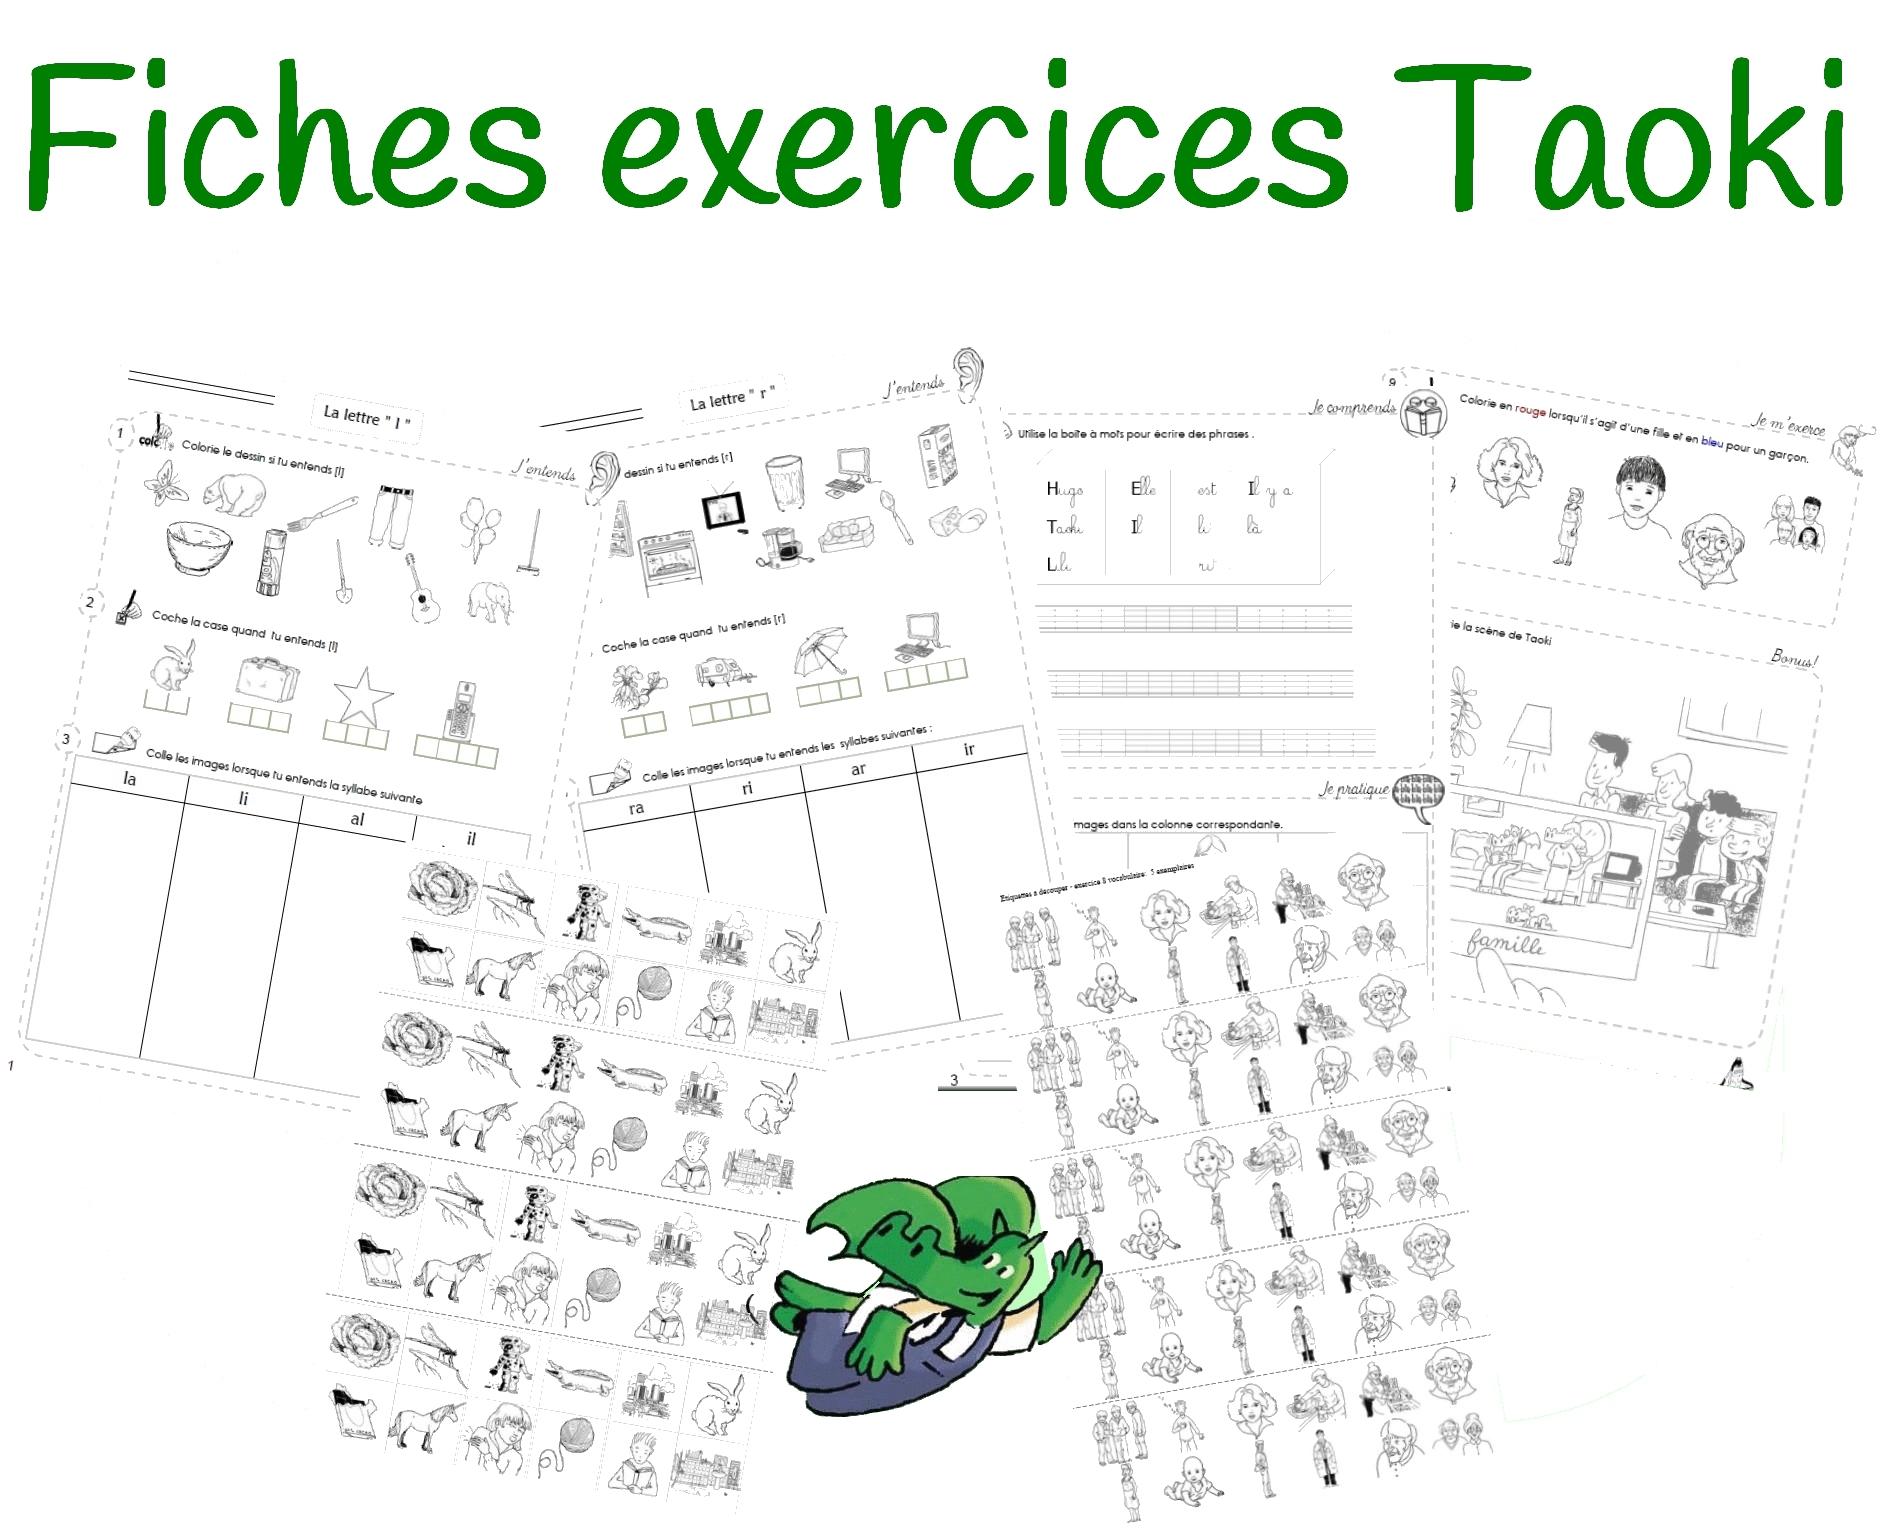 Gut gemocht Fiches d'exercices différenciées Taoki IM55